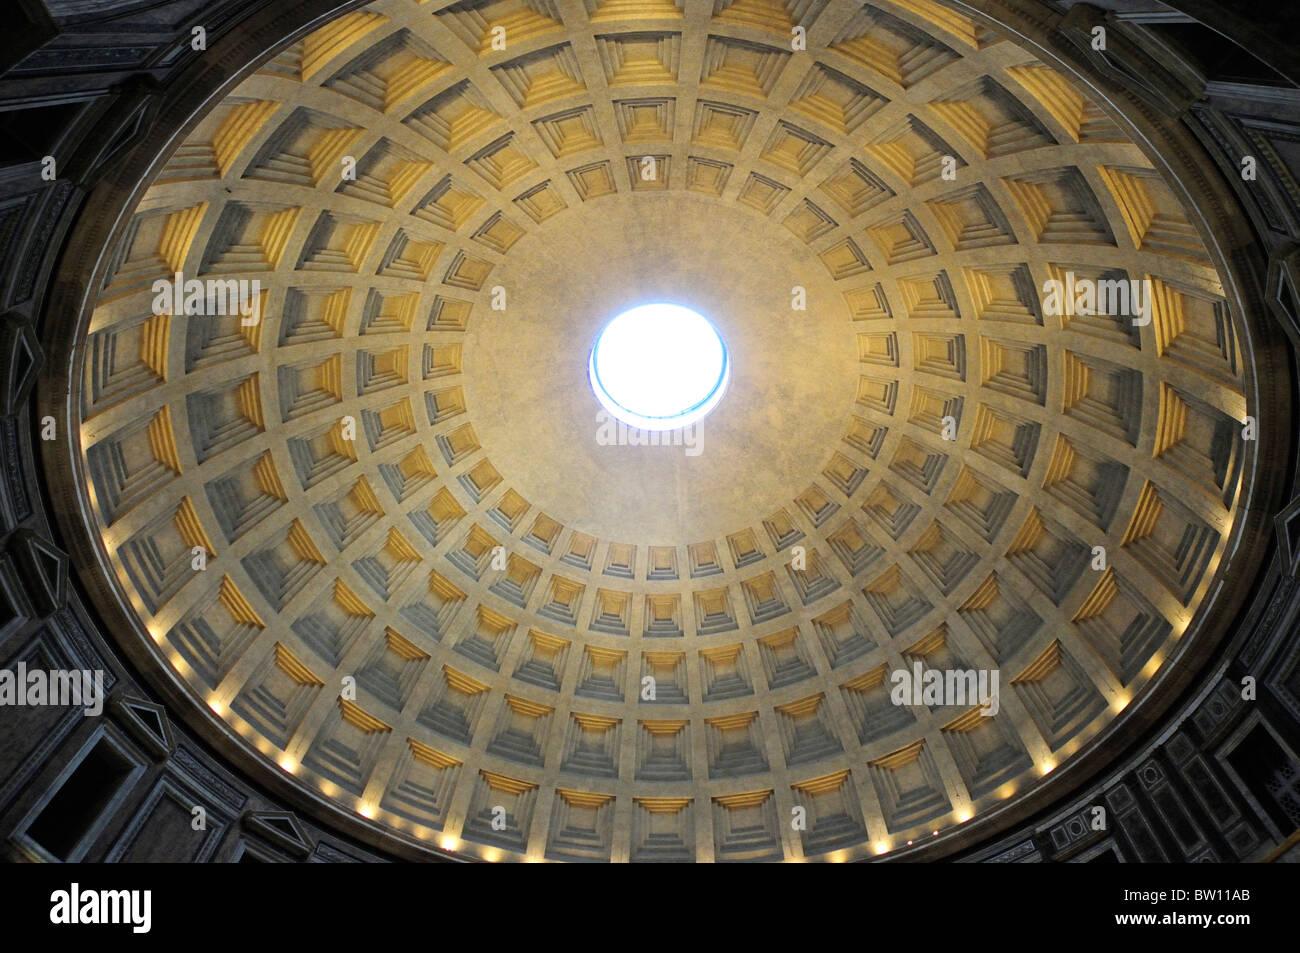 El Panteón, oculus & dome detalle Foto de stock